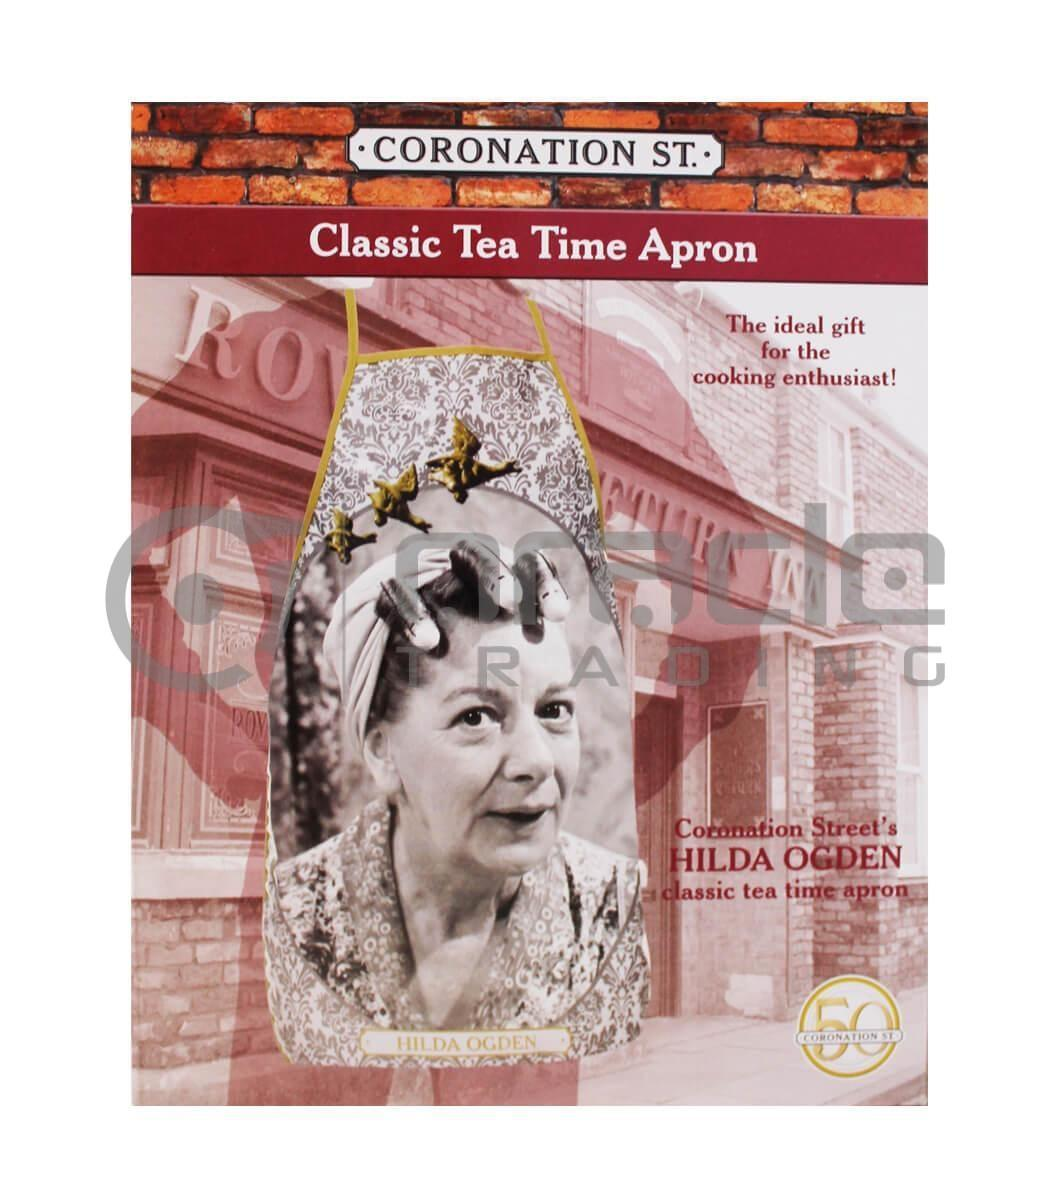 Coronation Street Apron - Hilda Ogden